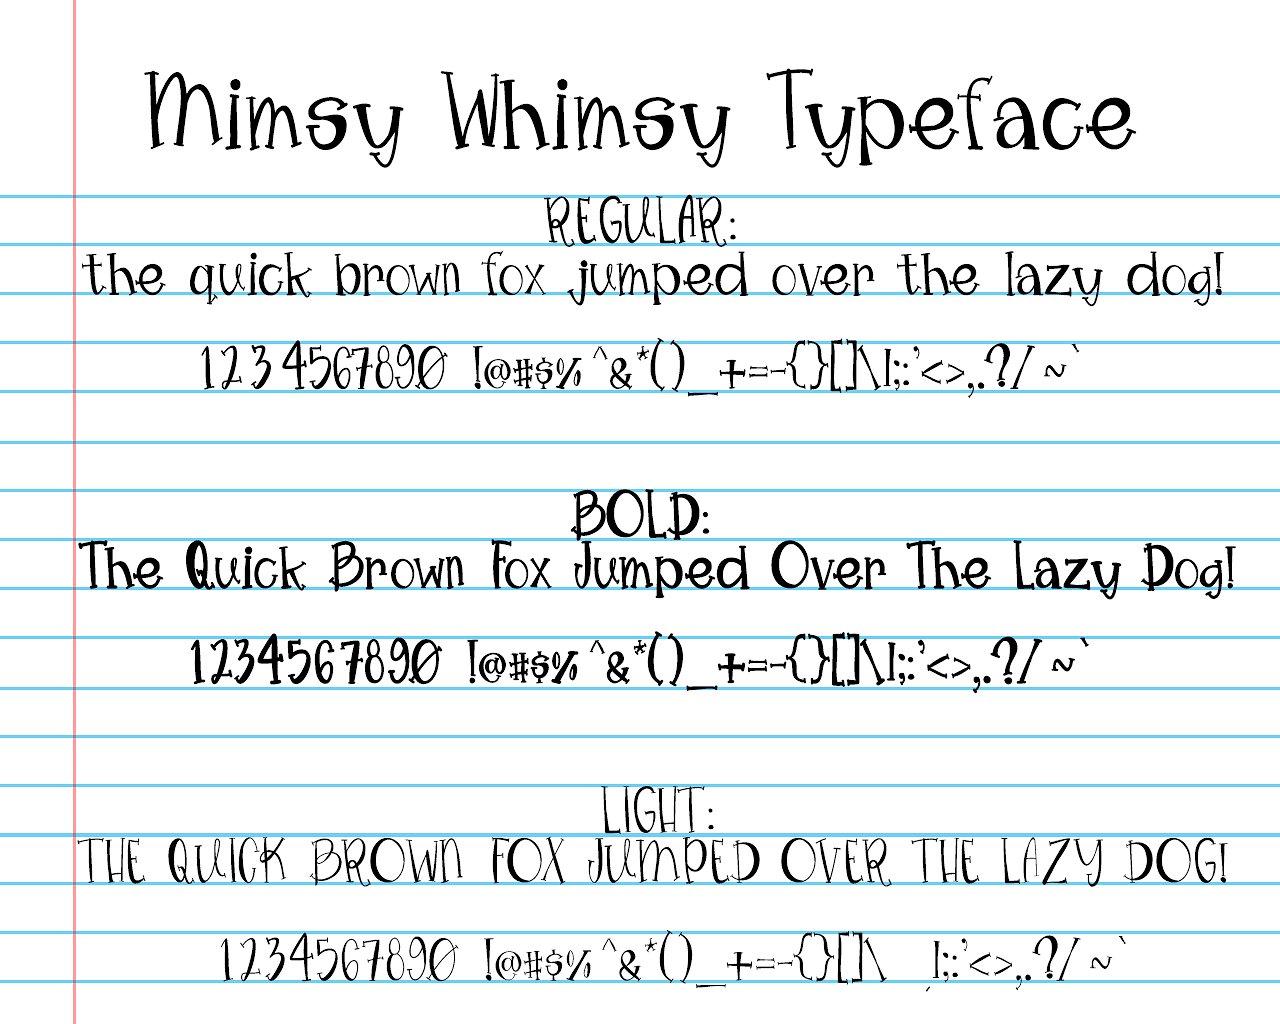 mimsy-whimsy-typeface-1